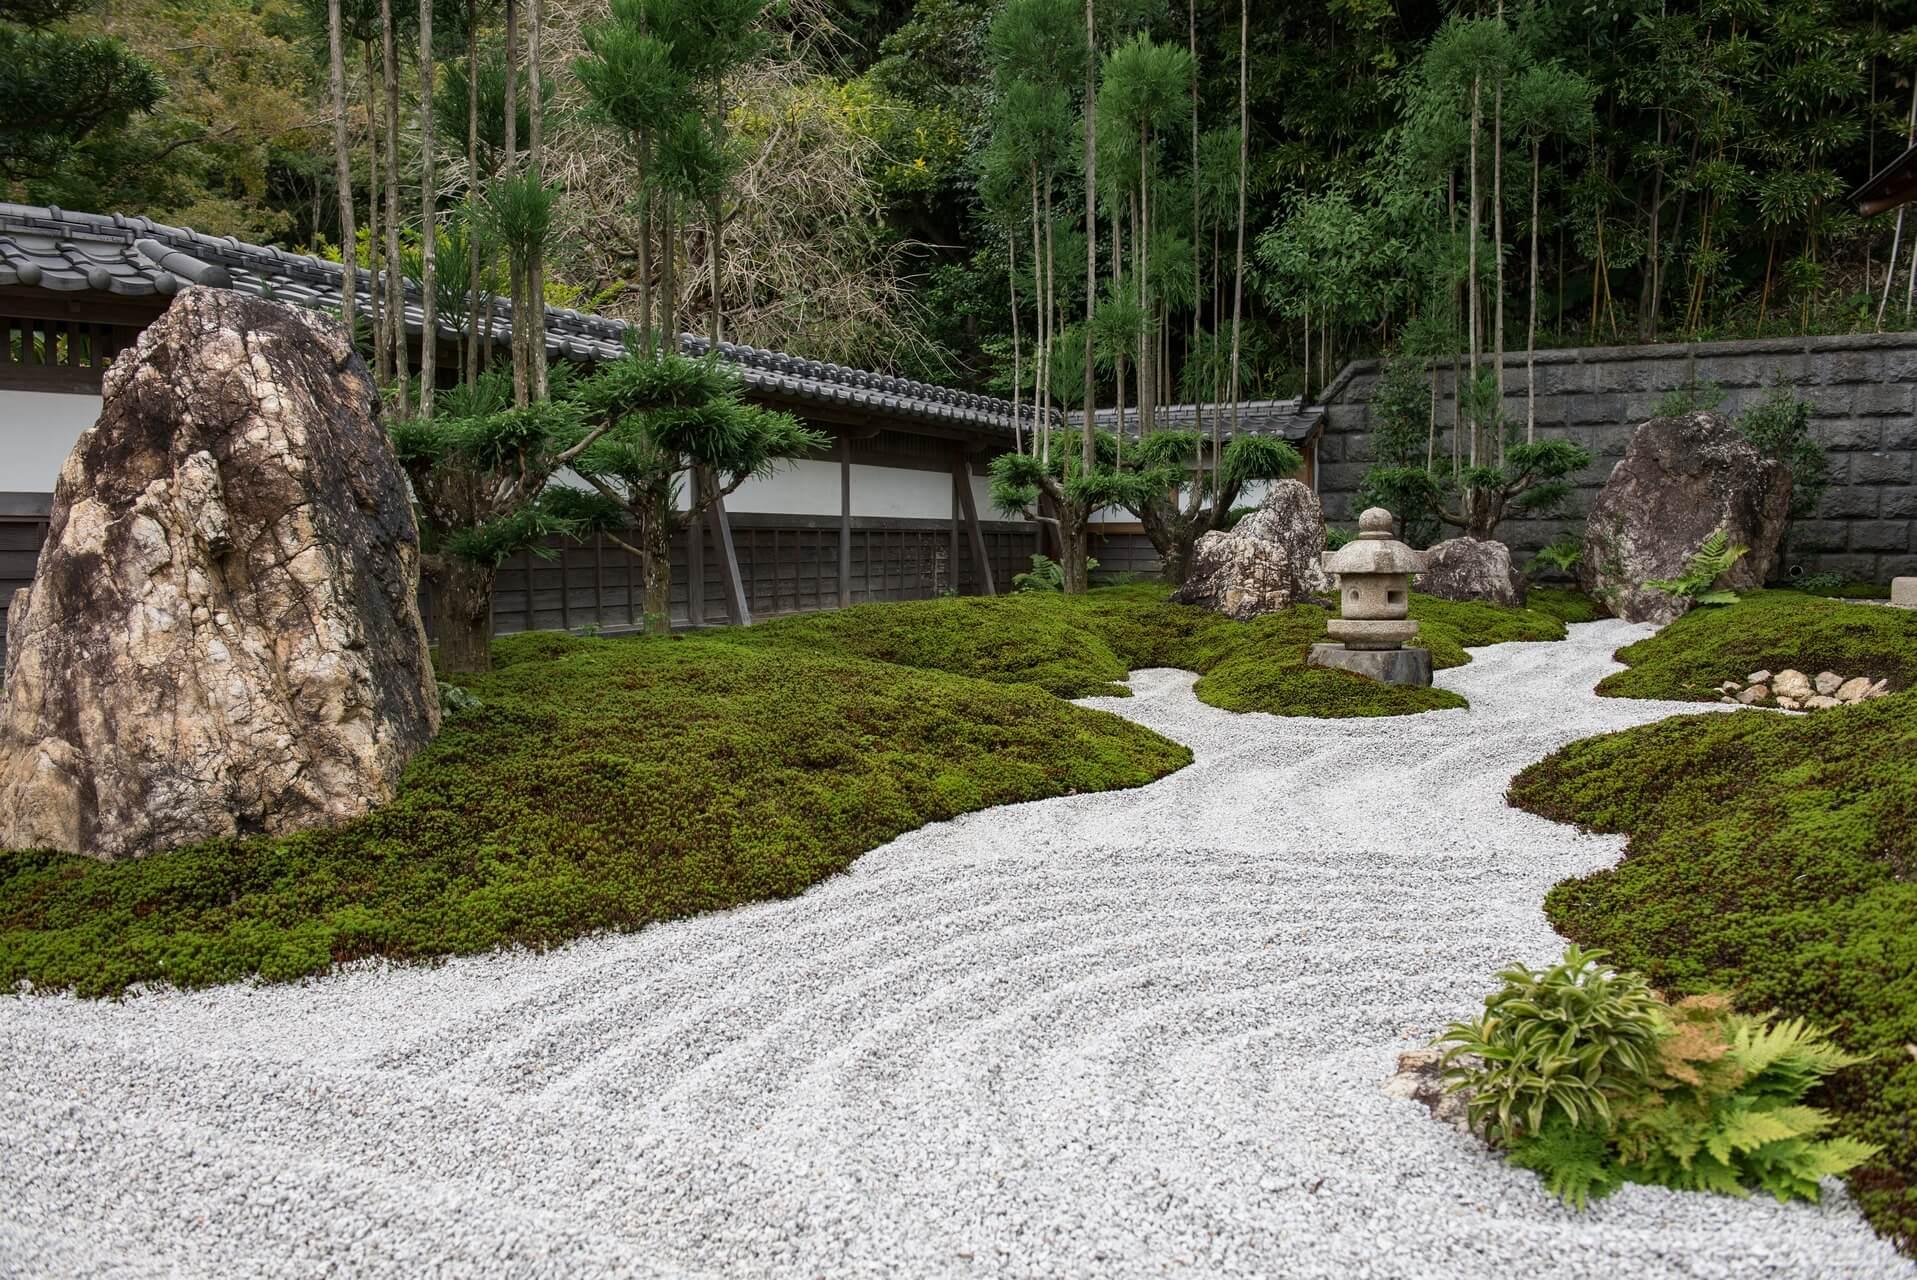 Japan Kamakura Tempel Zen Garden, Fotograf: Steffen Lohse